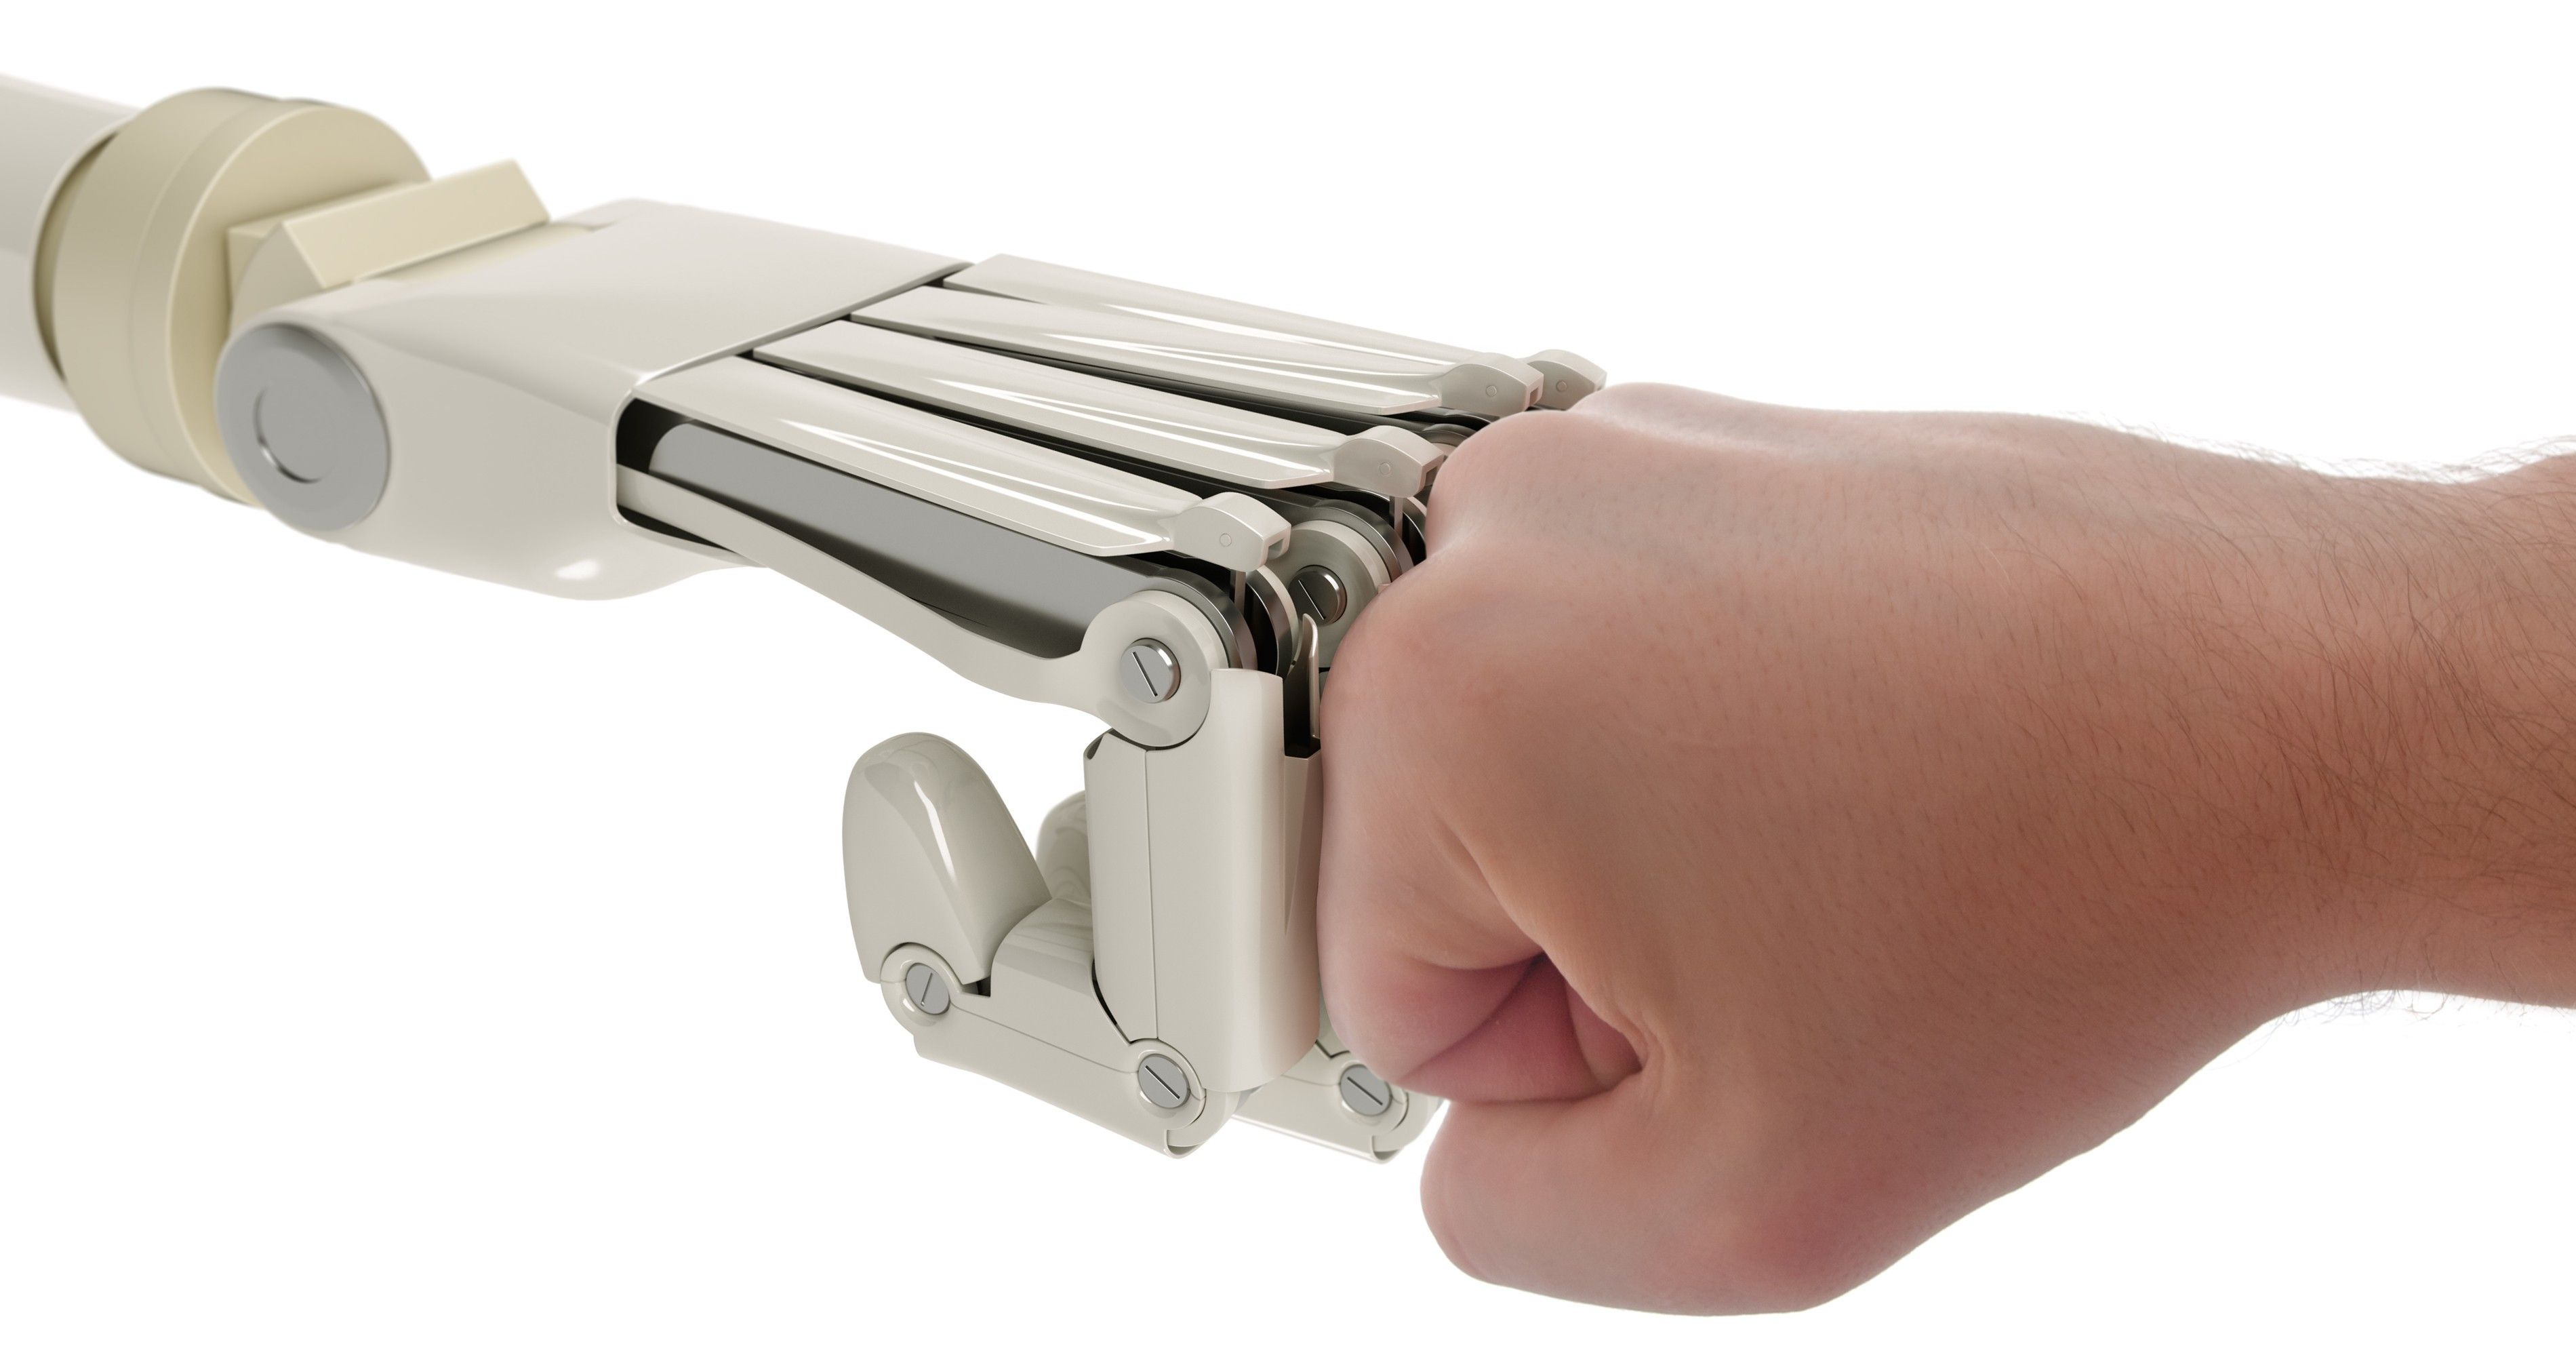 Humane Tech Rheinland - Digital Ethics and beyond